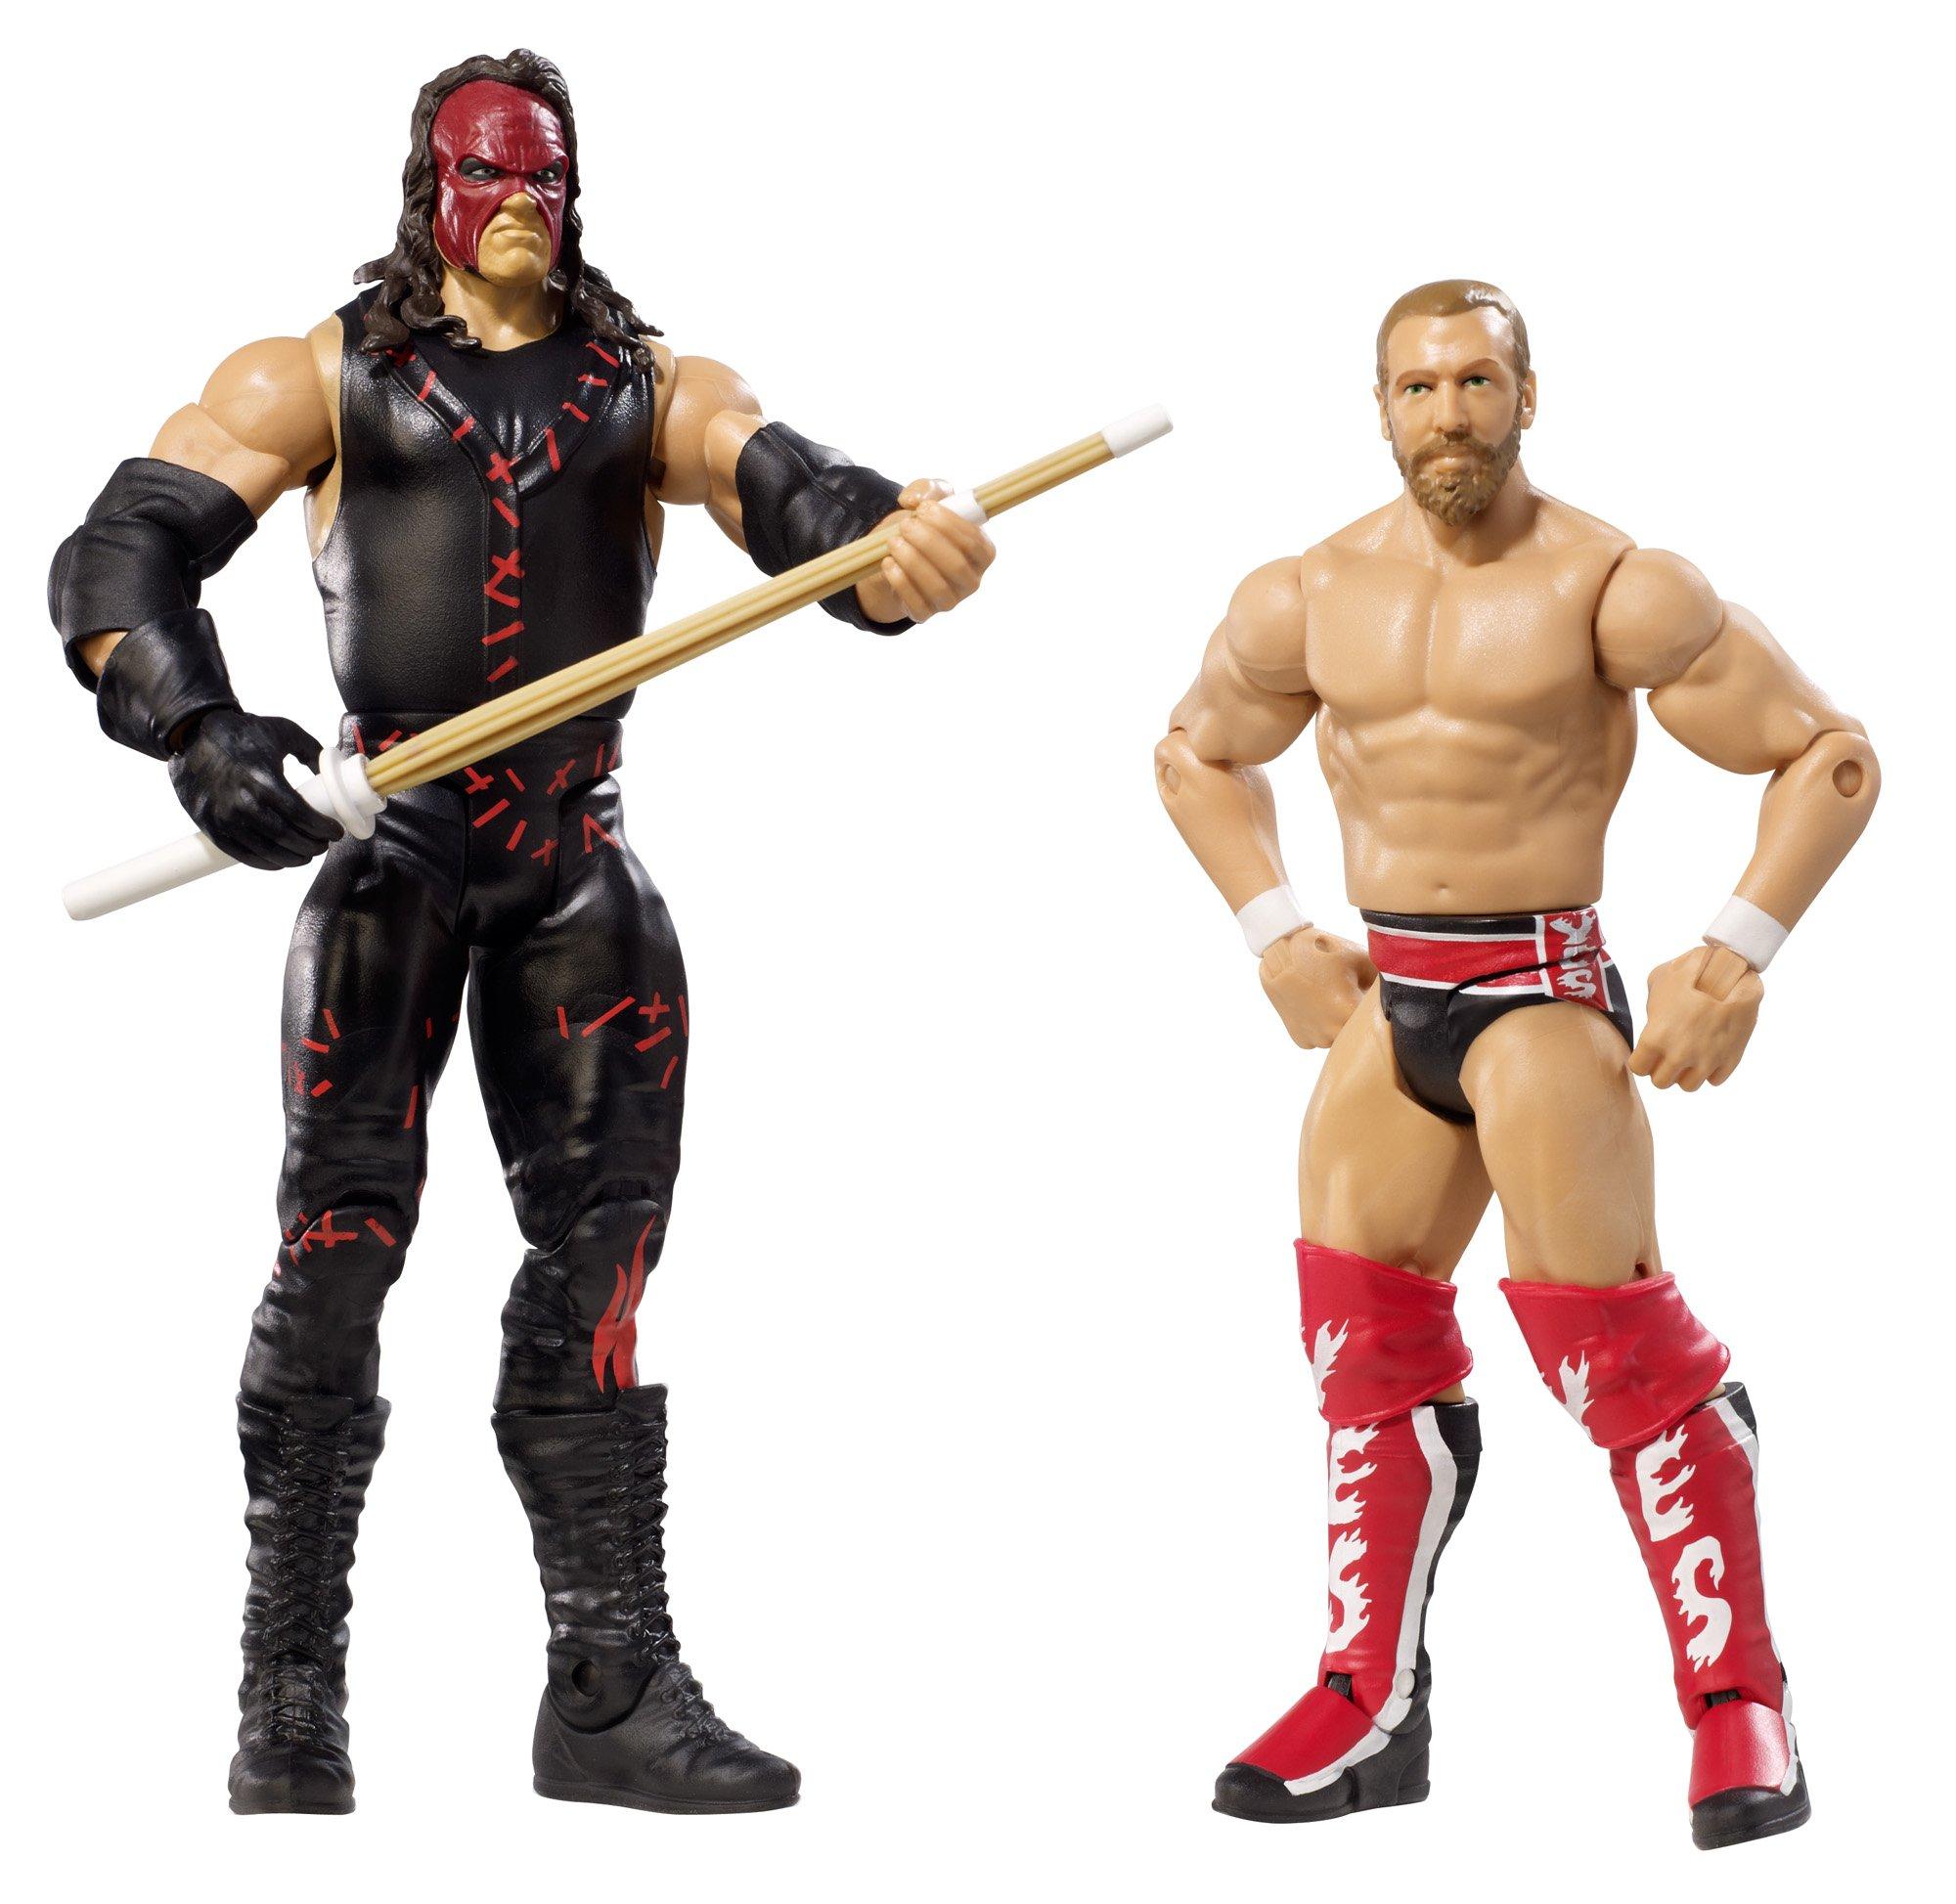 WWE Series 21 Battle Pack: Daniel Bryan vs. Kane Figure, 2-Pack by WWE